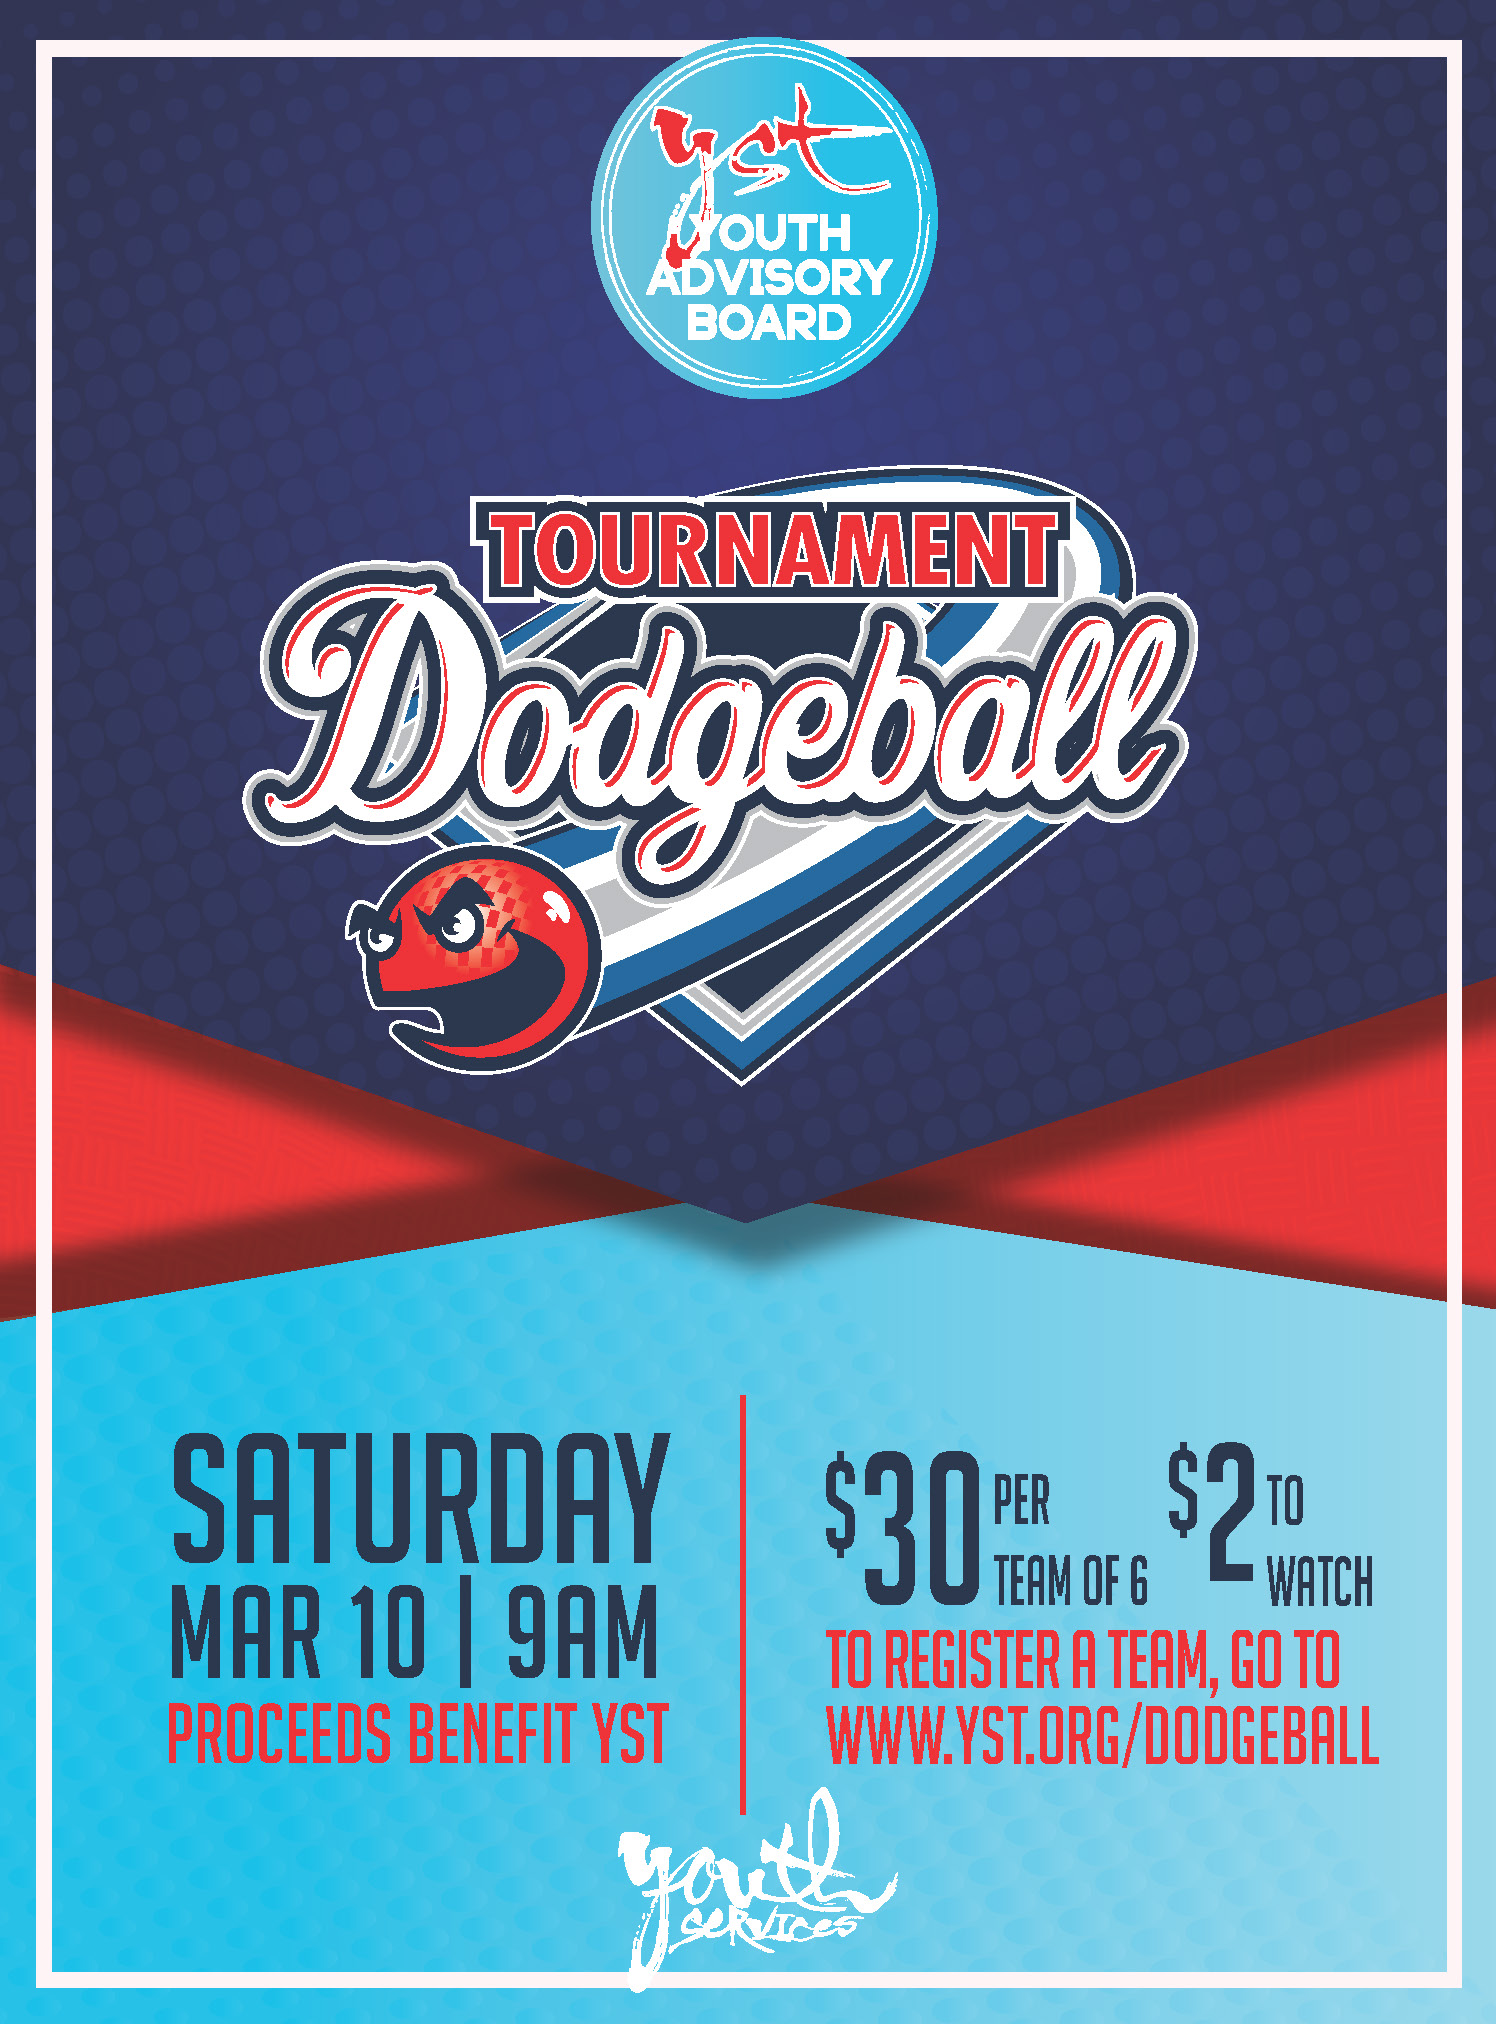 Dodgeball flyer 8.5x11.jpg